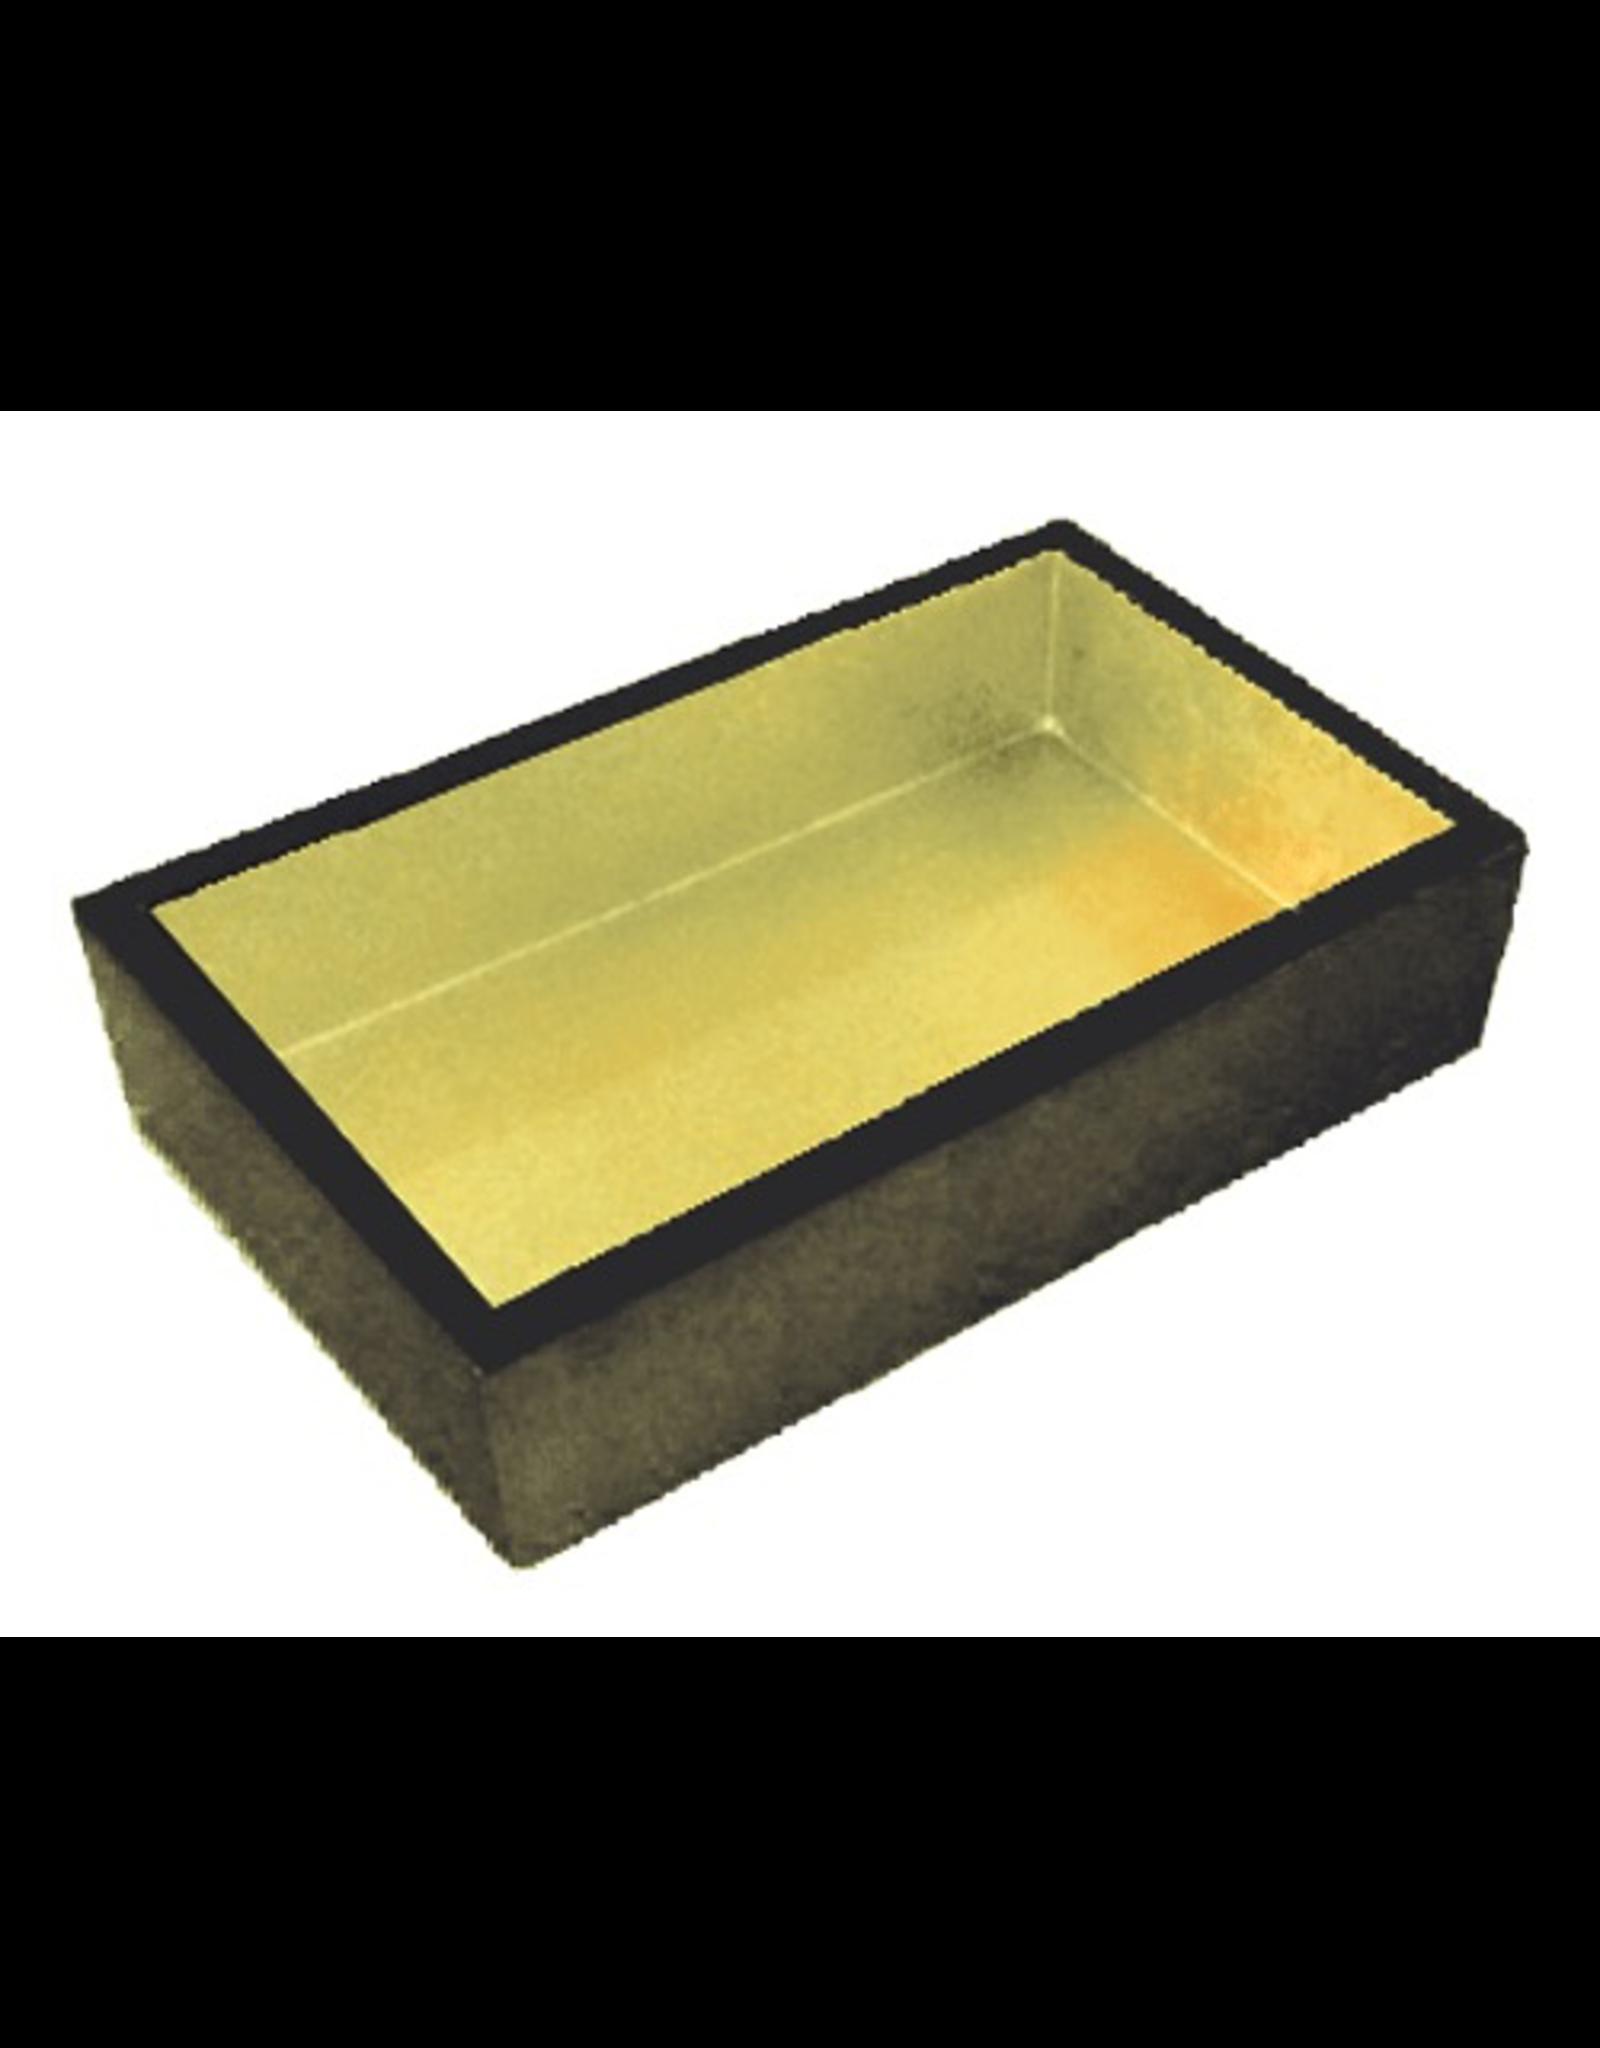 Caspari Black w Gold Lacquer Guest Towel Napkin Holder